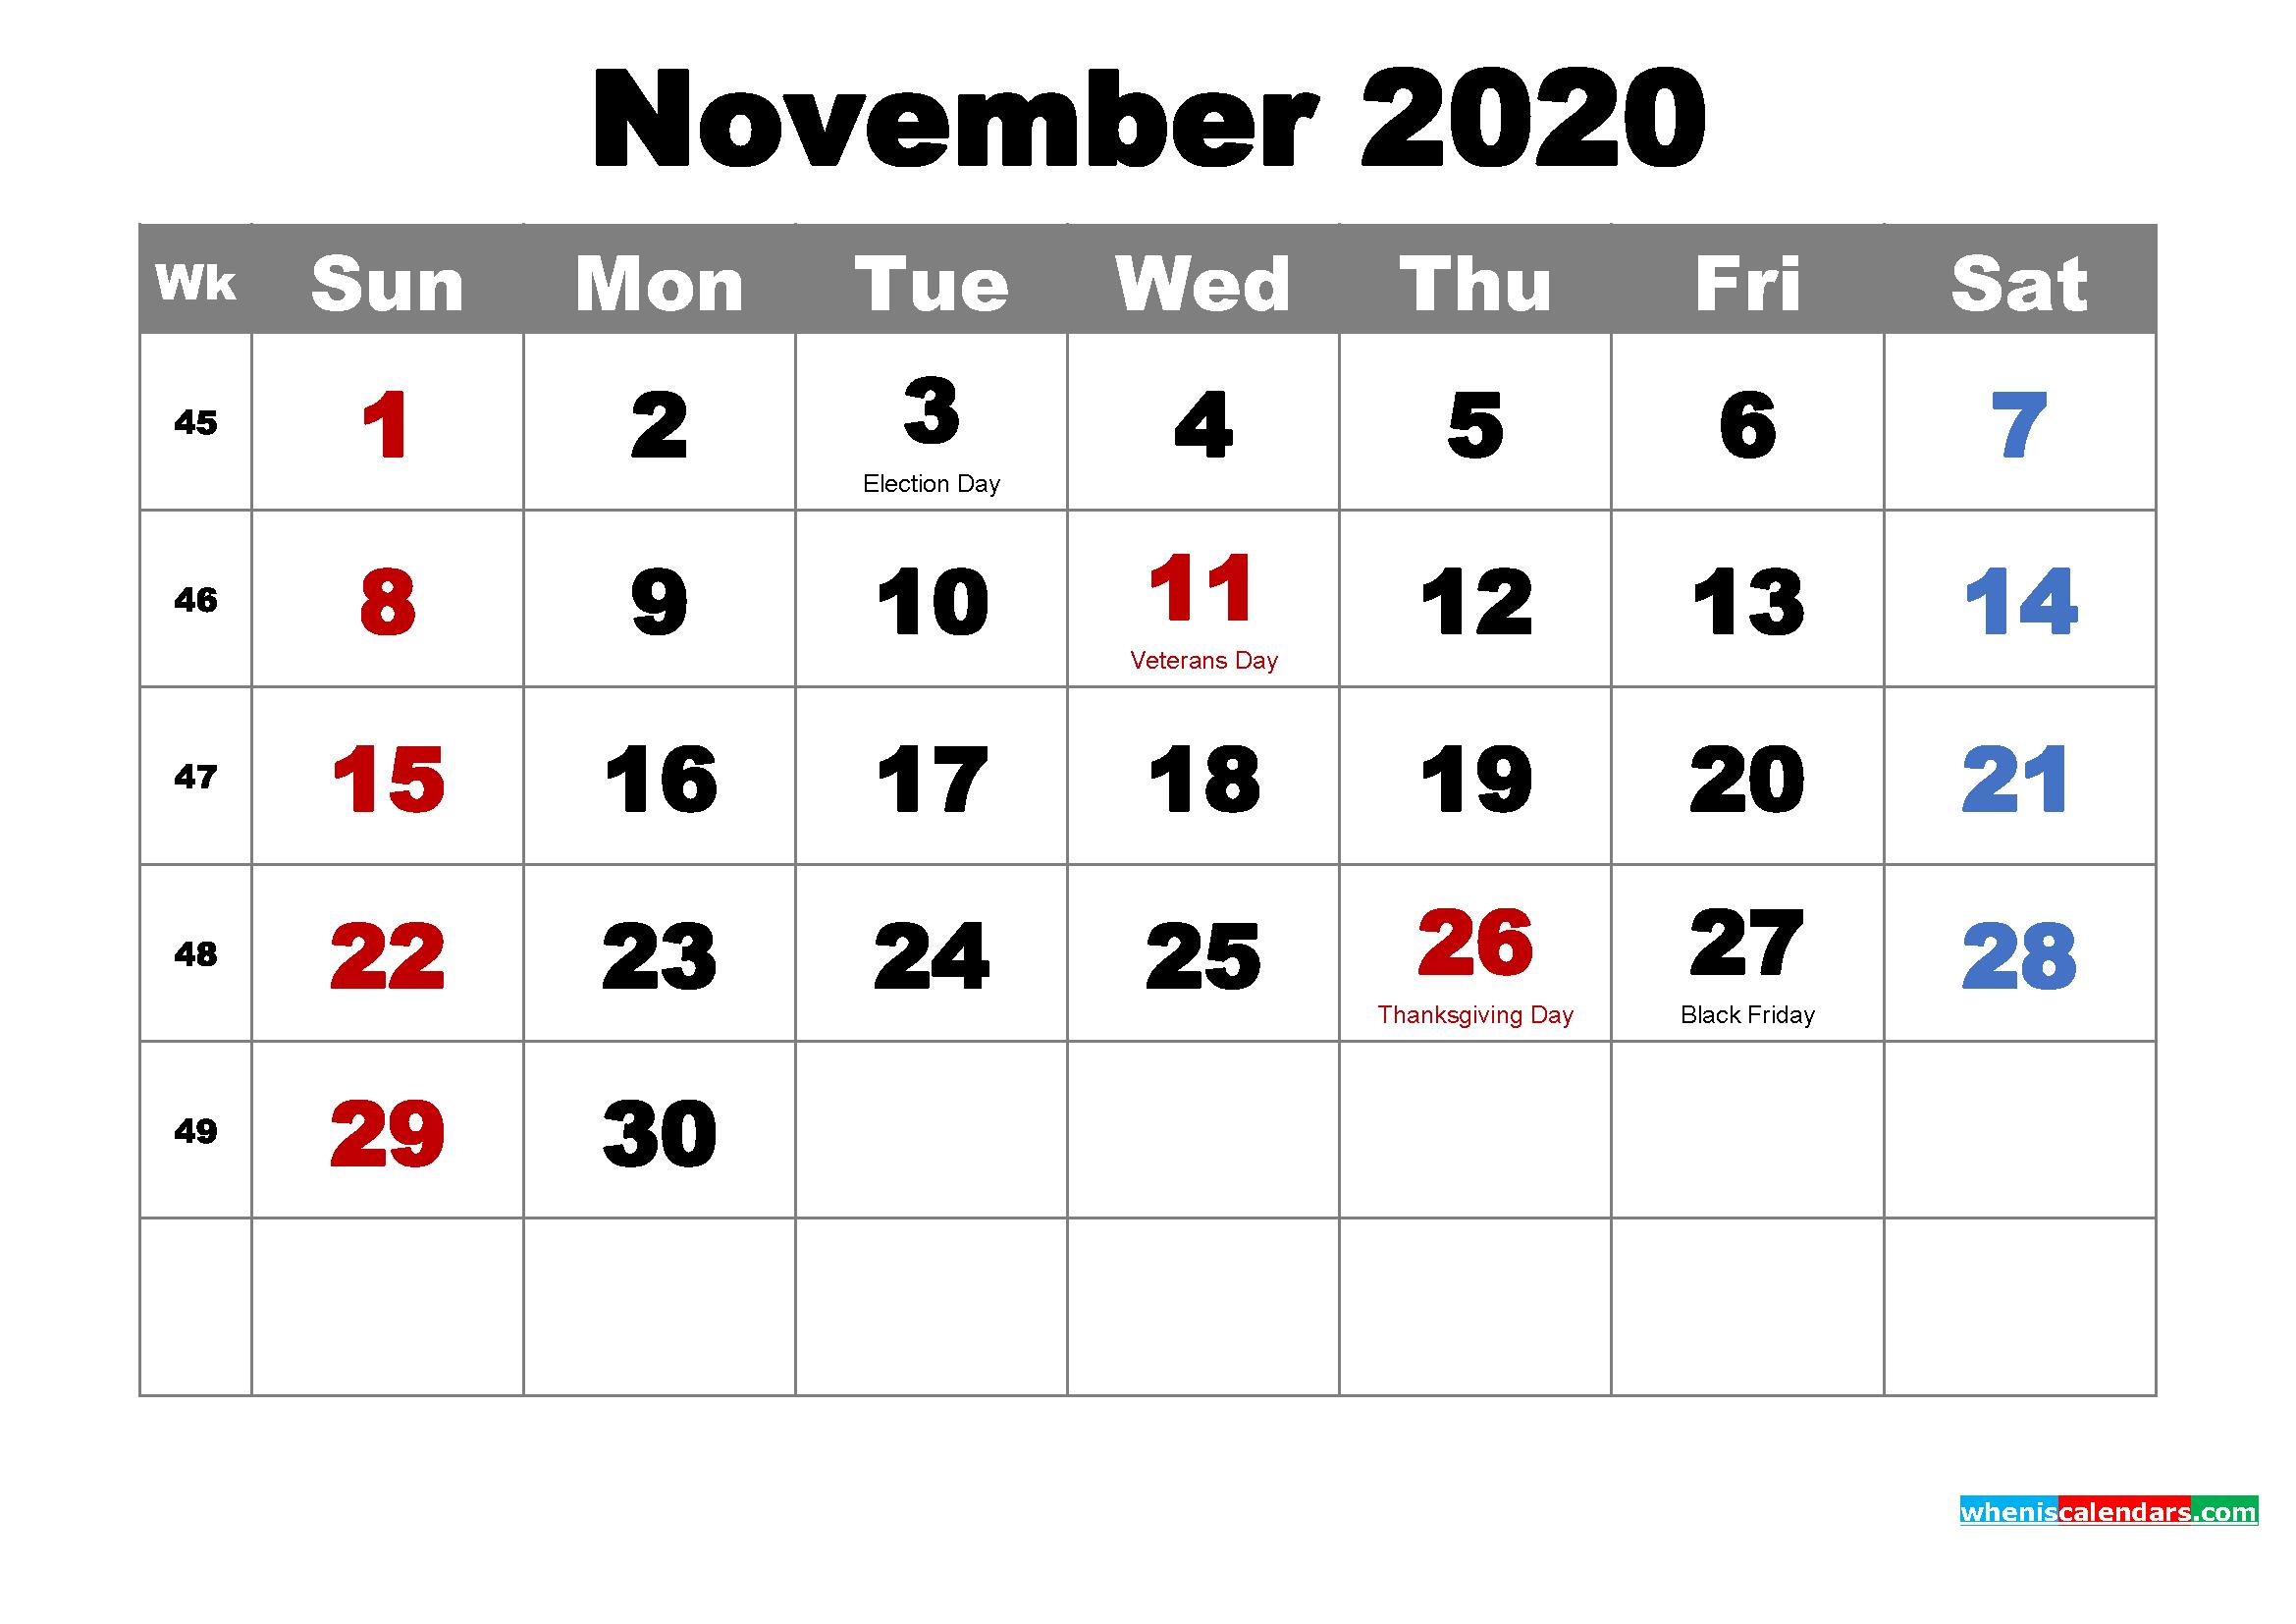 Free Printable November 2020 Calendar Wallpaper - 2021 ...